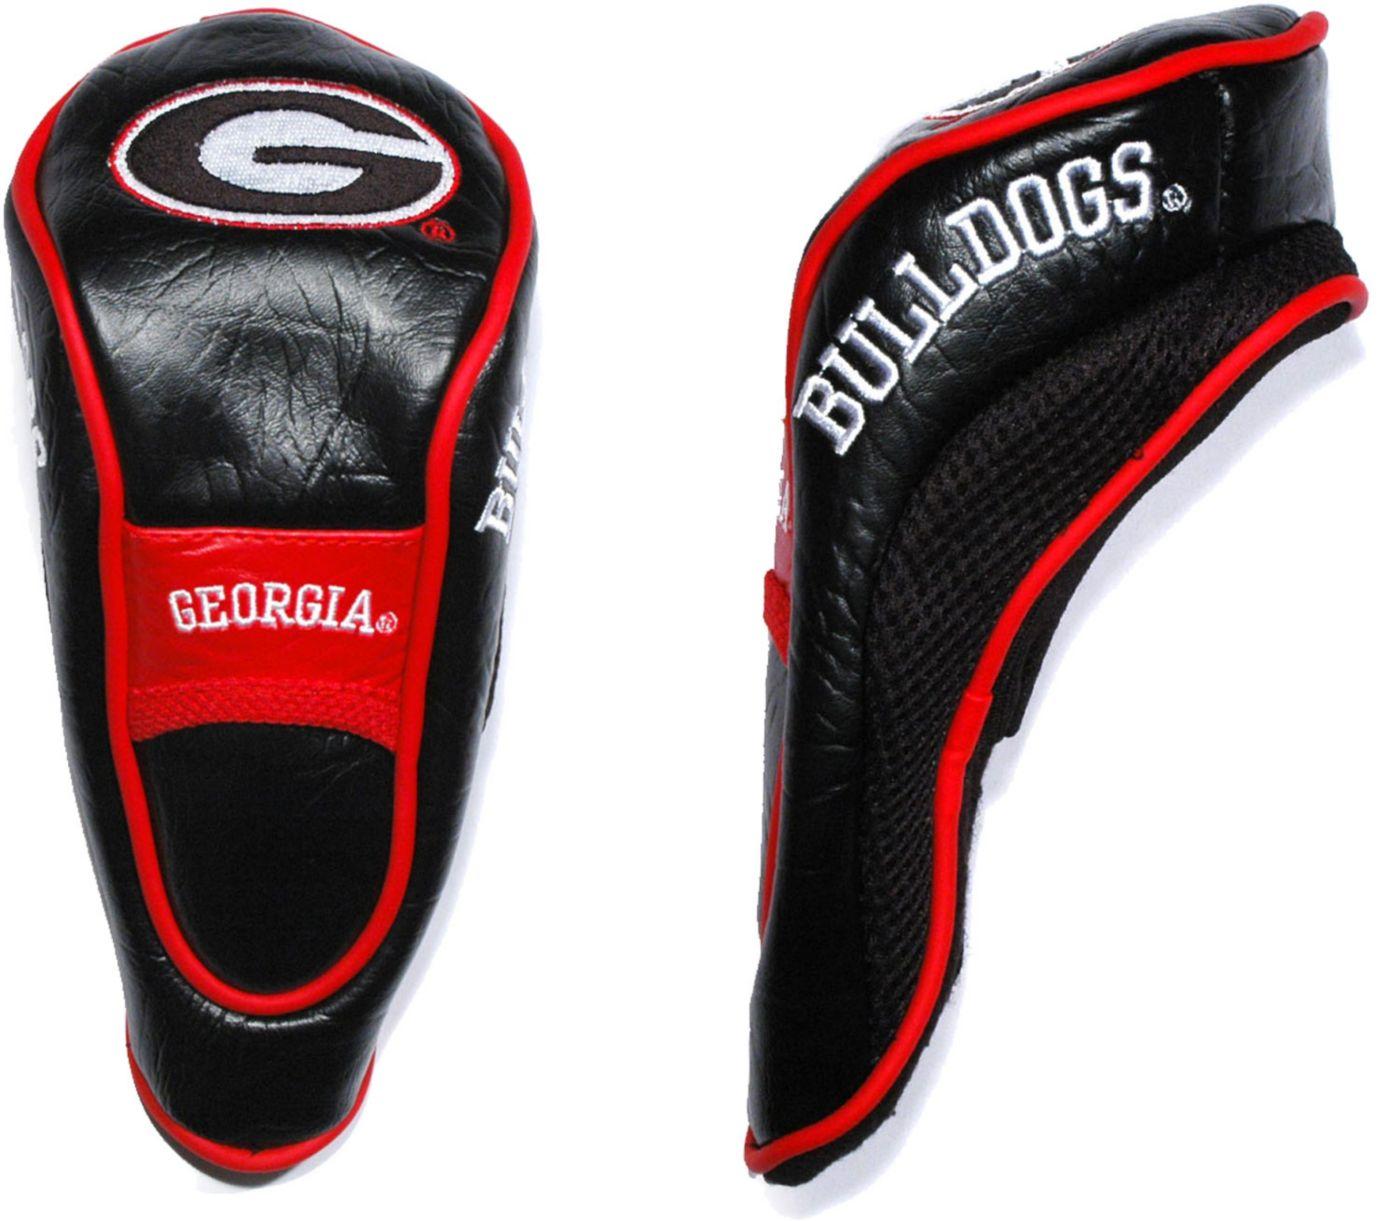 Team Golf Georgia Bulldogs Hybrid Headcover